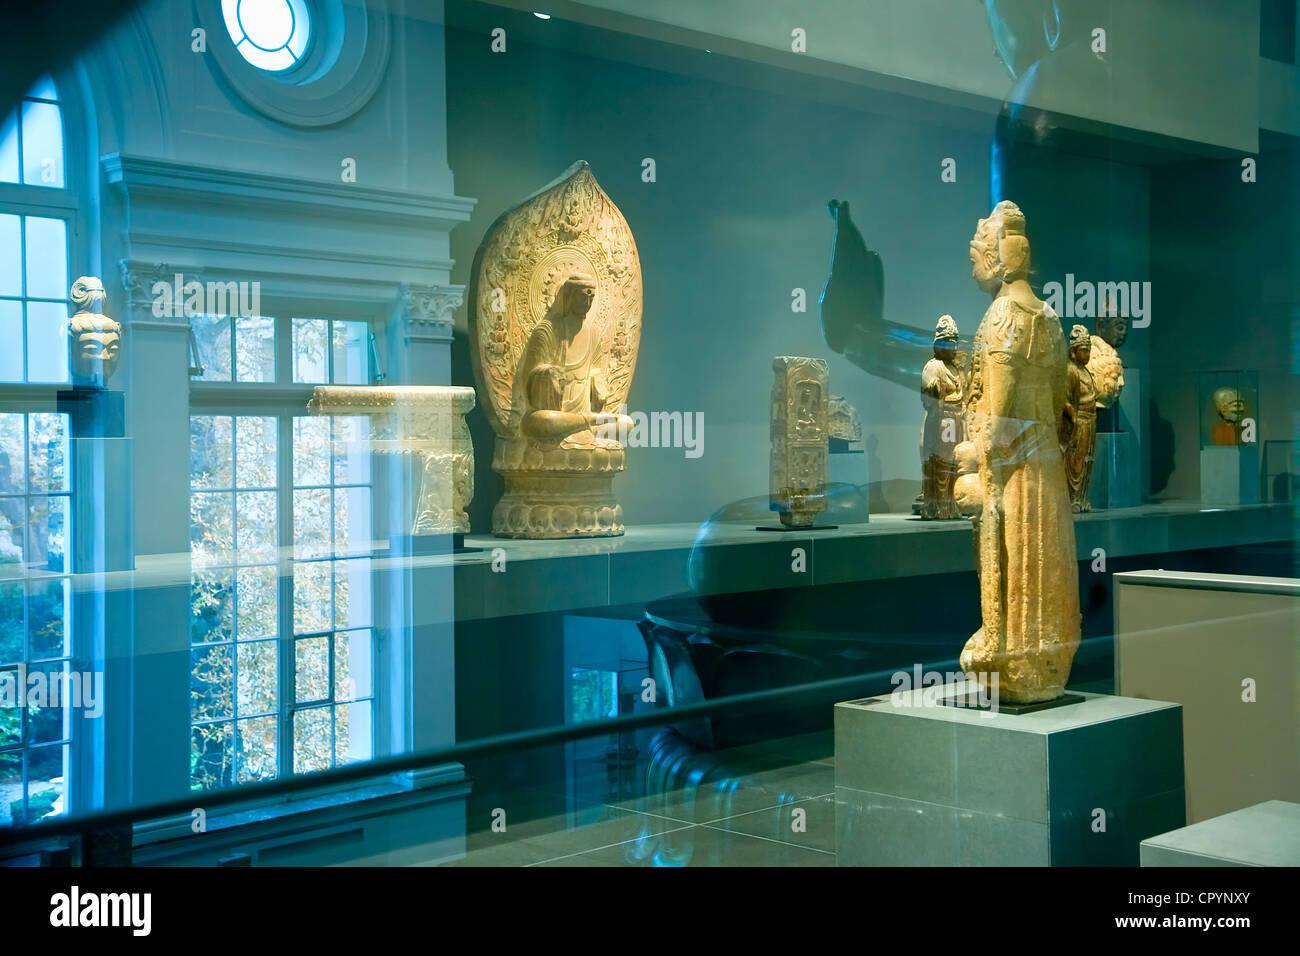 France, Paris, Musee Cernuschi, Museum of Asian Art - Stock Image